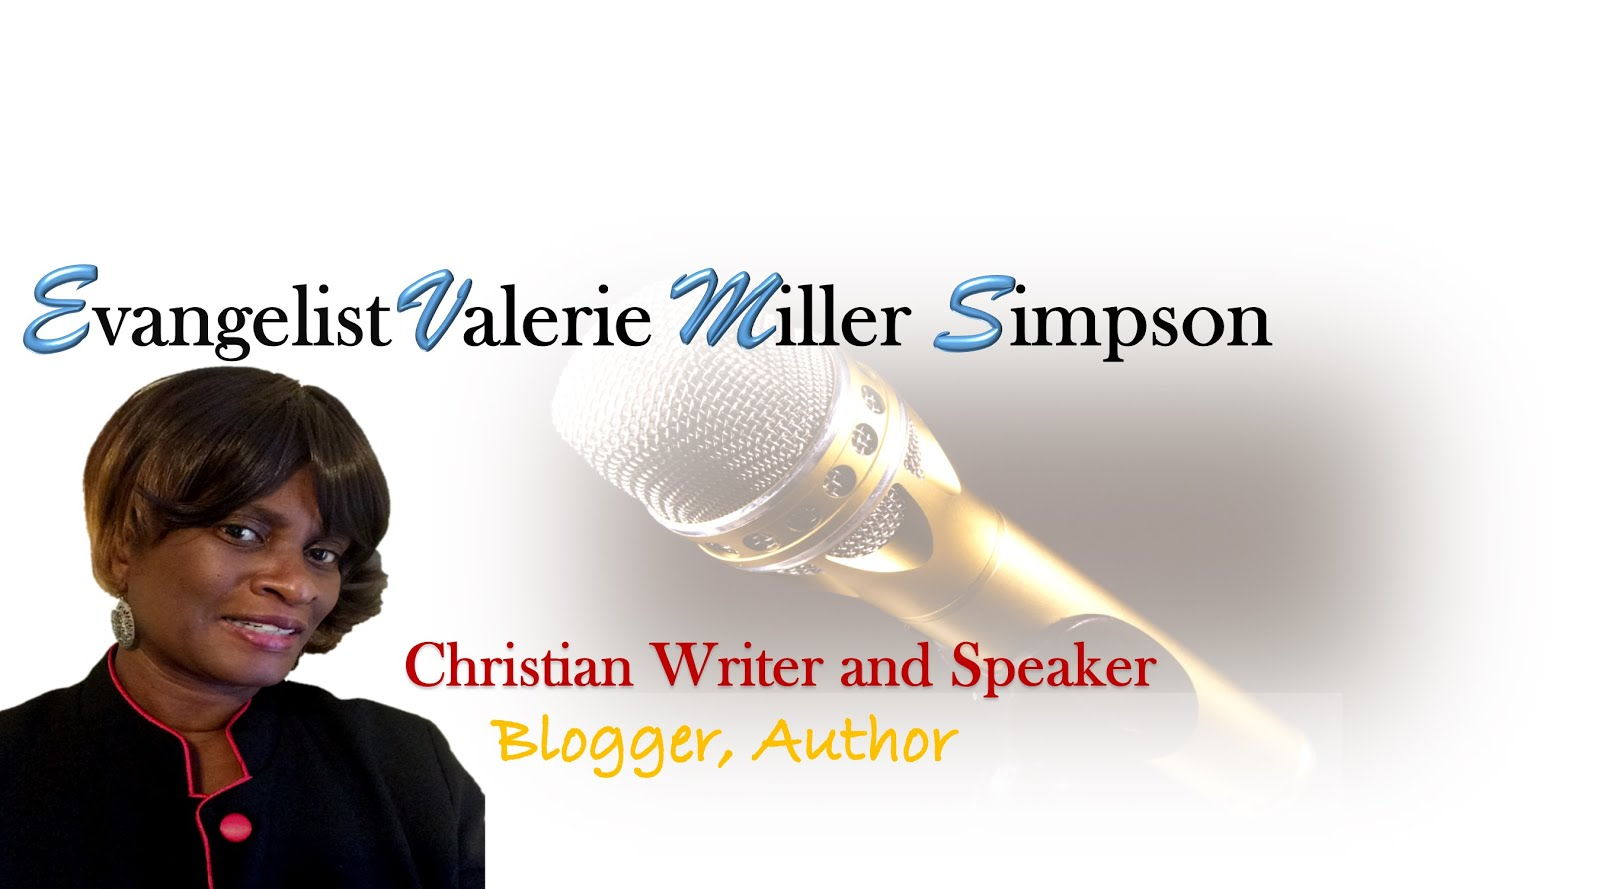 Evangelist Valerie Miller Simpson